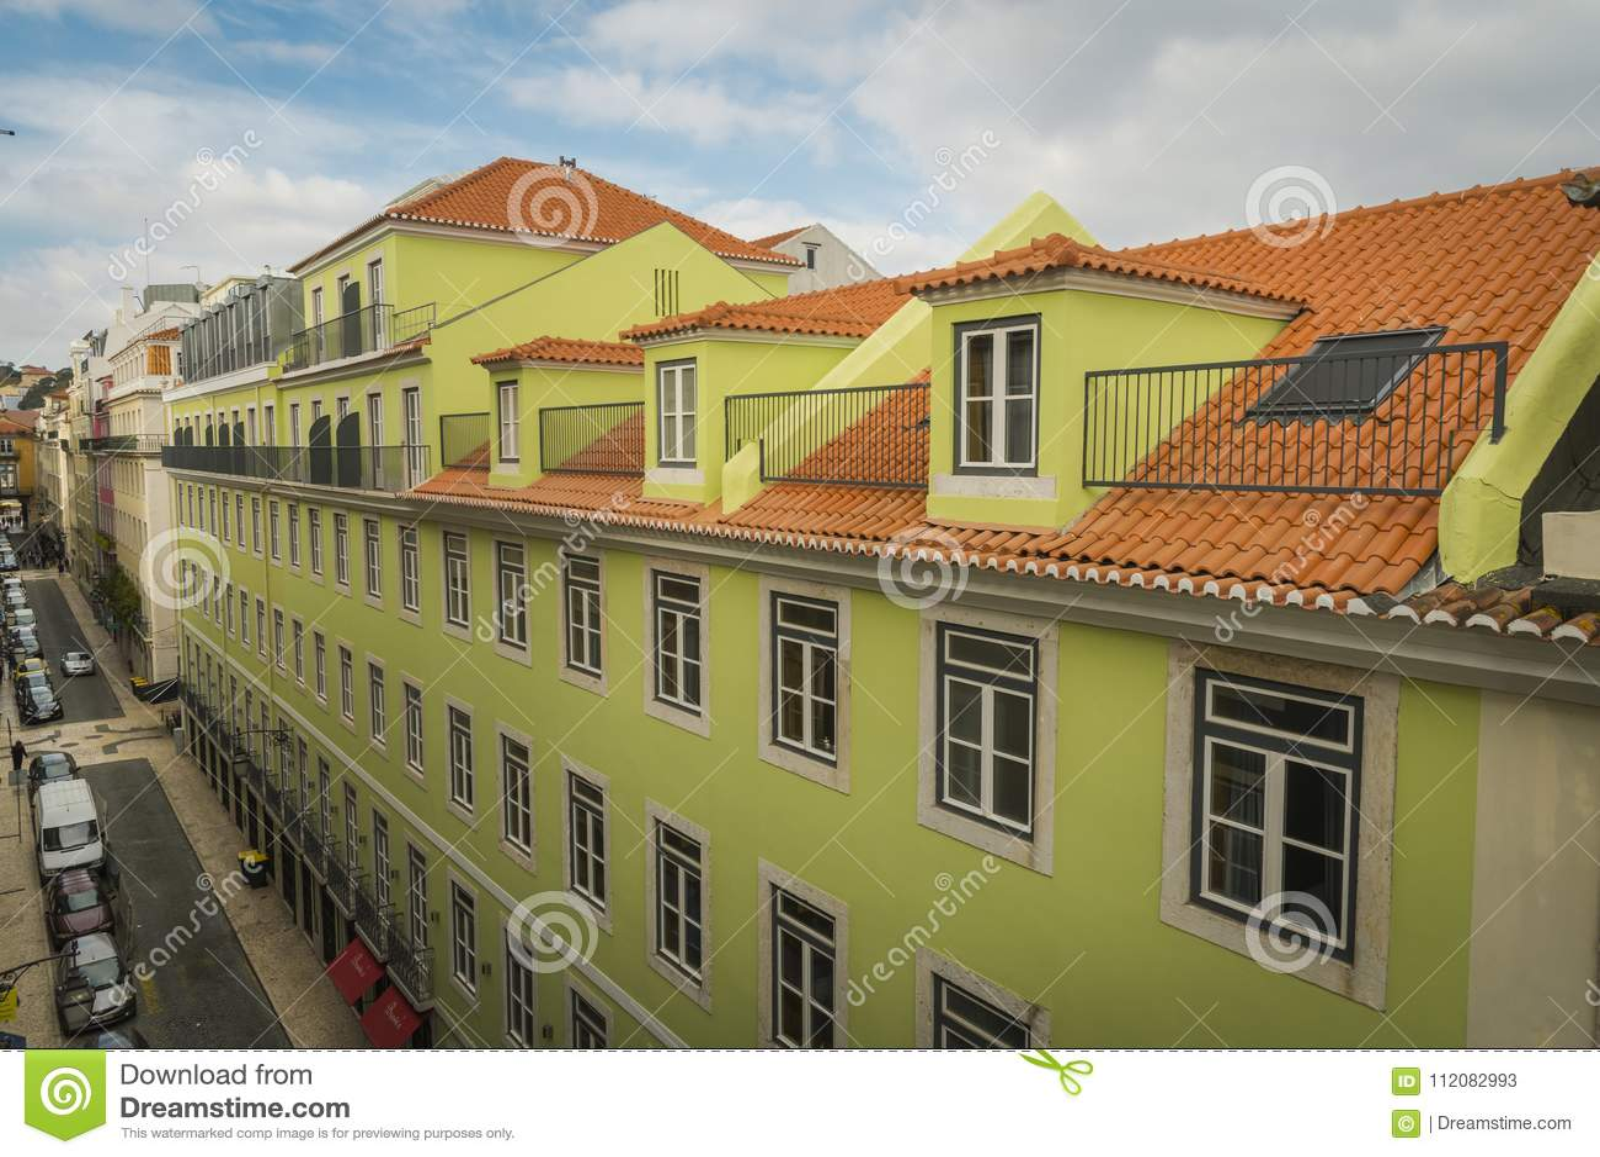 LISSABON/PORTUGAL - FEBRUARI 17 2018: MENING VAN BALKON BIJ OUD C